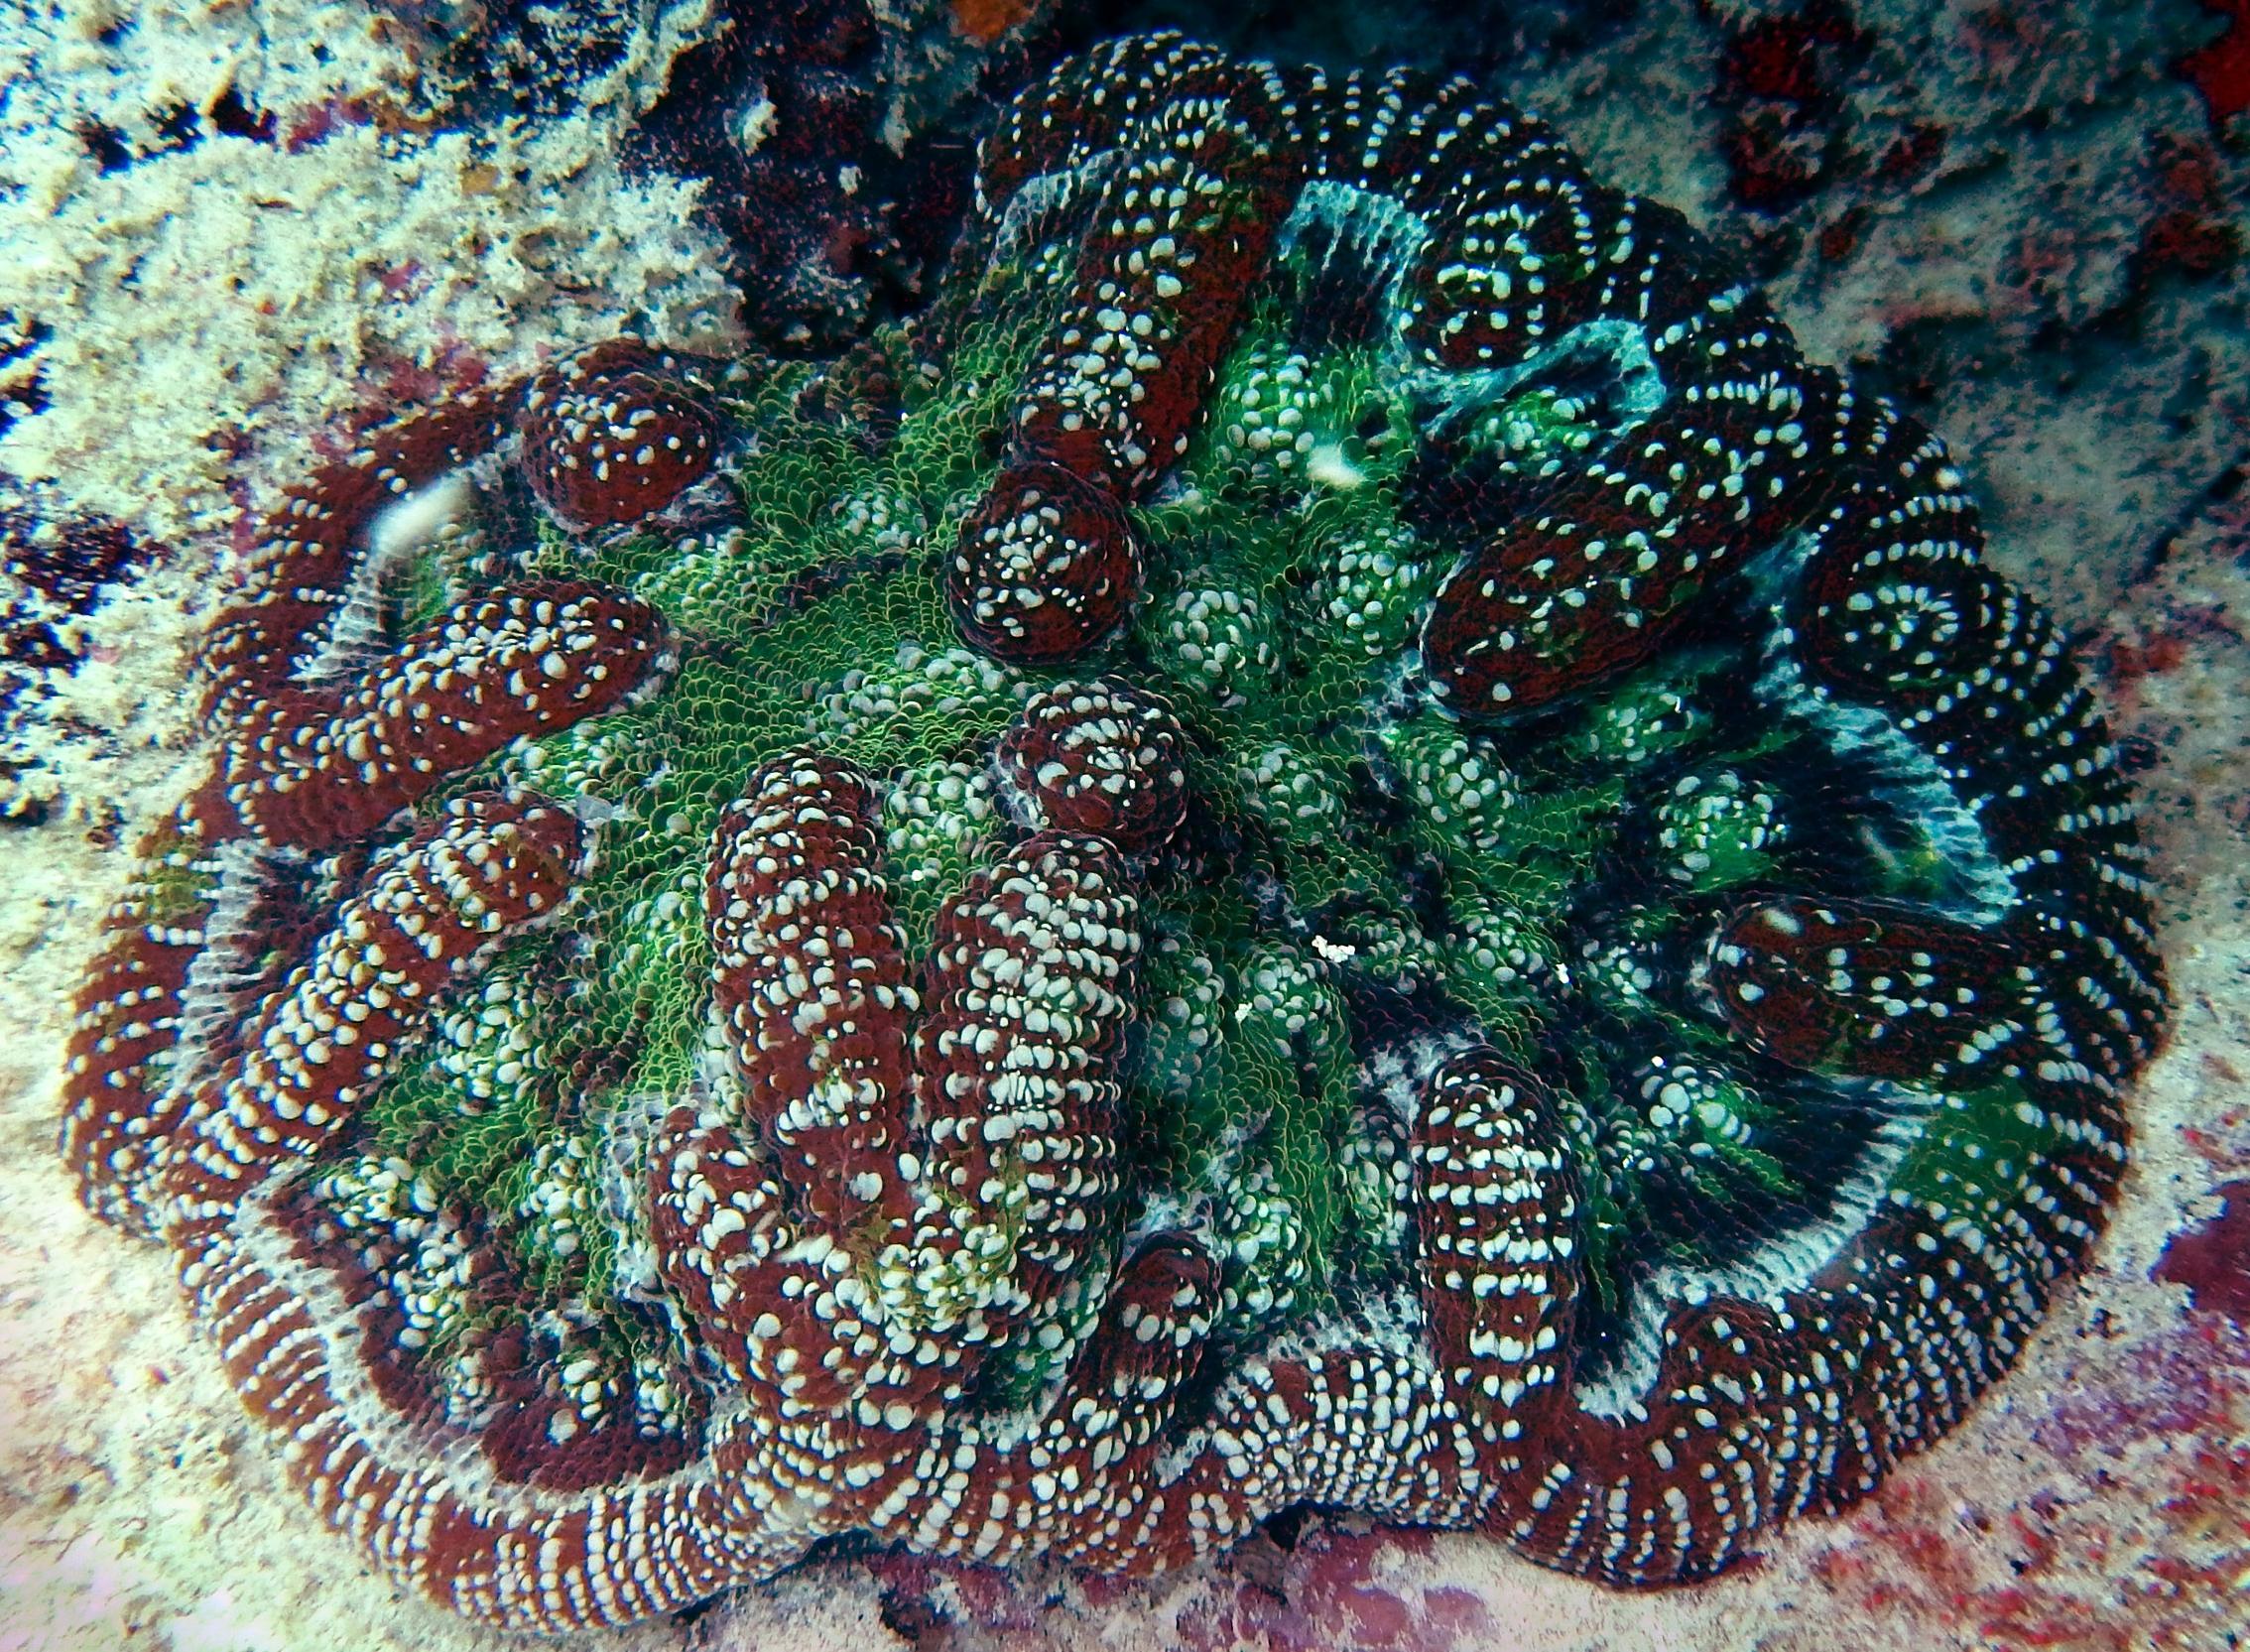 A ridged cactus coral ( Mycetophyllia lamarckiana ) at Emerald Reef, FL.